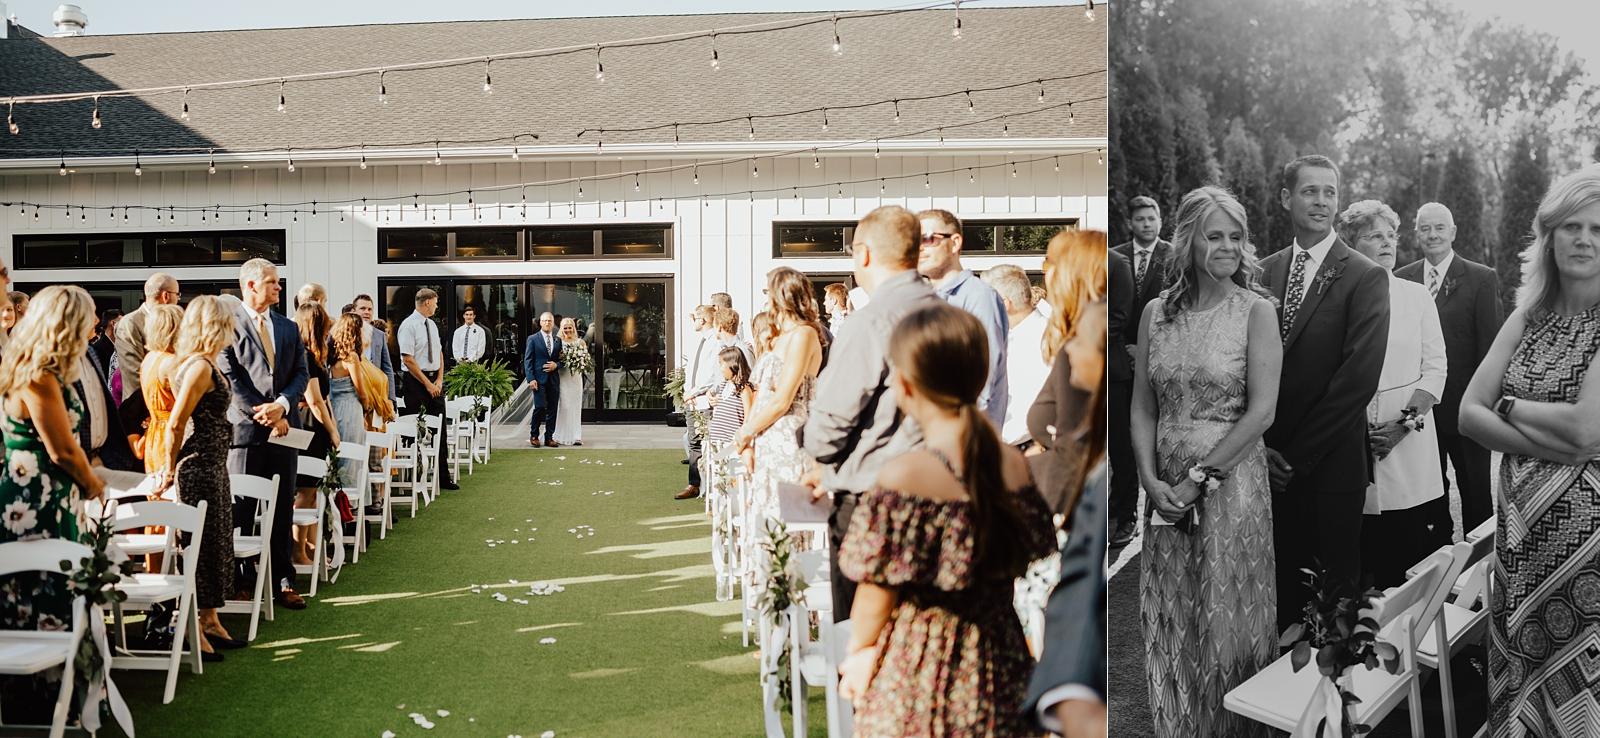 Anna & Trey Modern Minneapolis Wedding at The Hutton House_0715.jpg